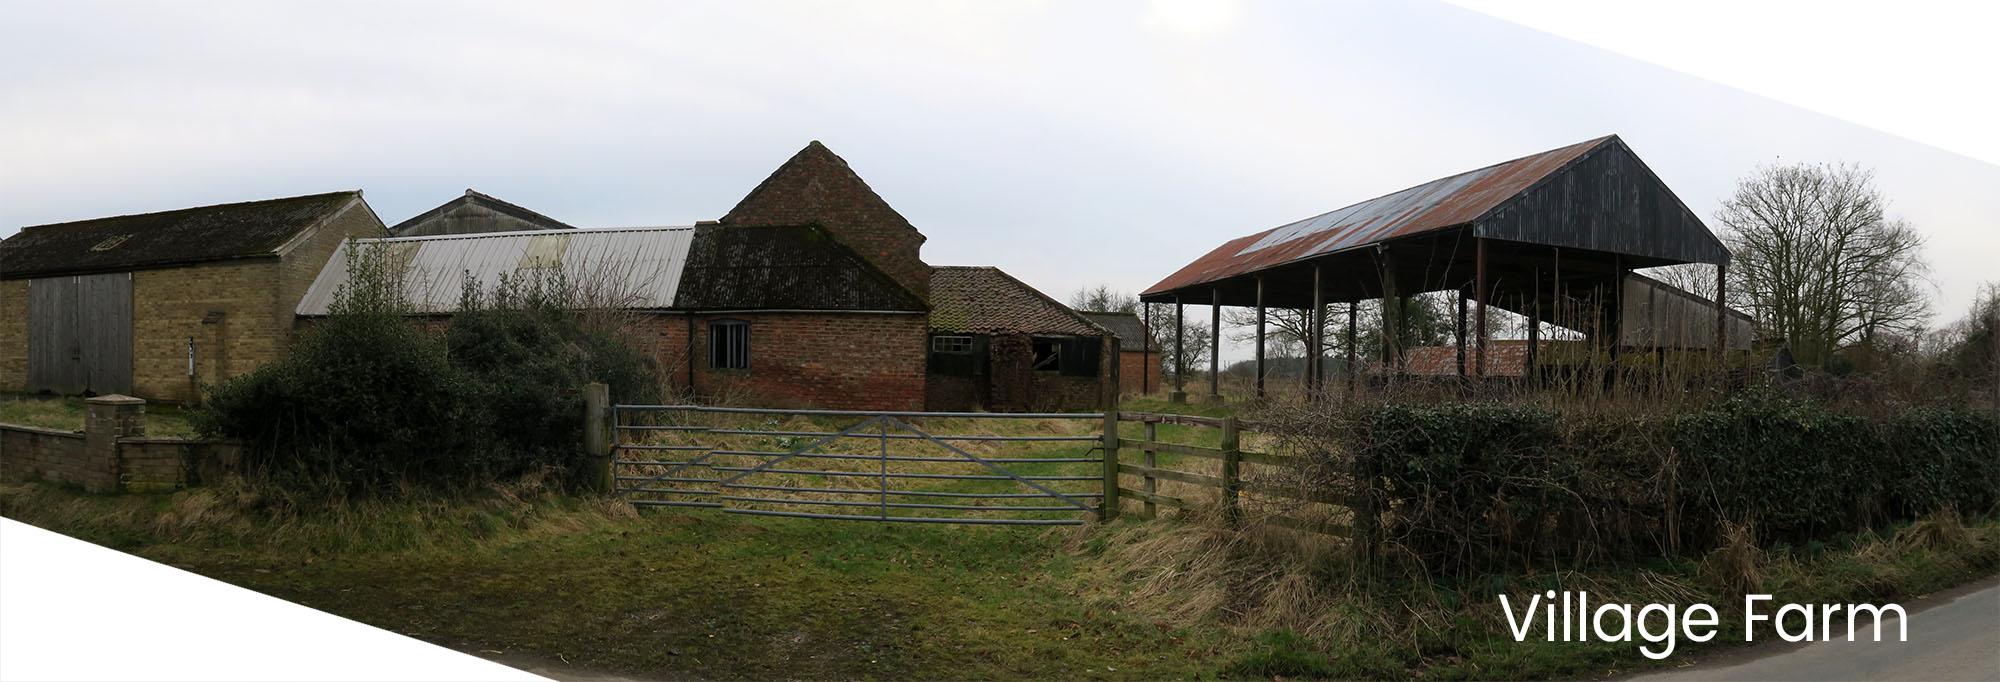 Niven Architects - Village Farm.jpg